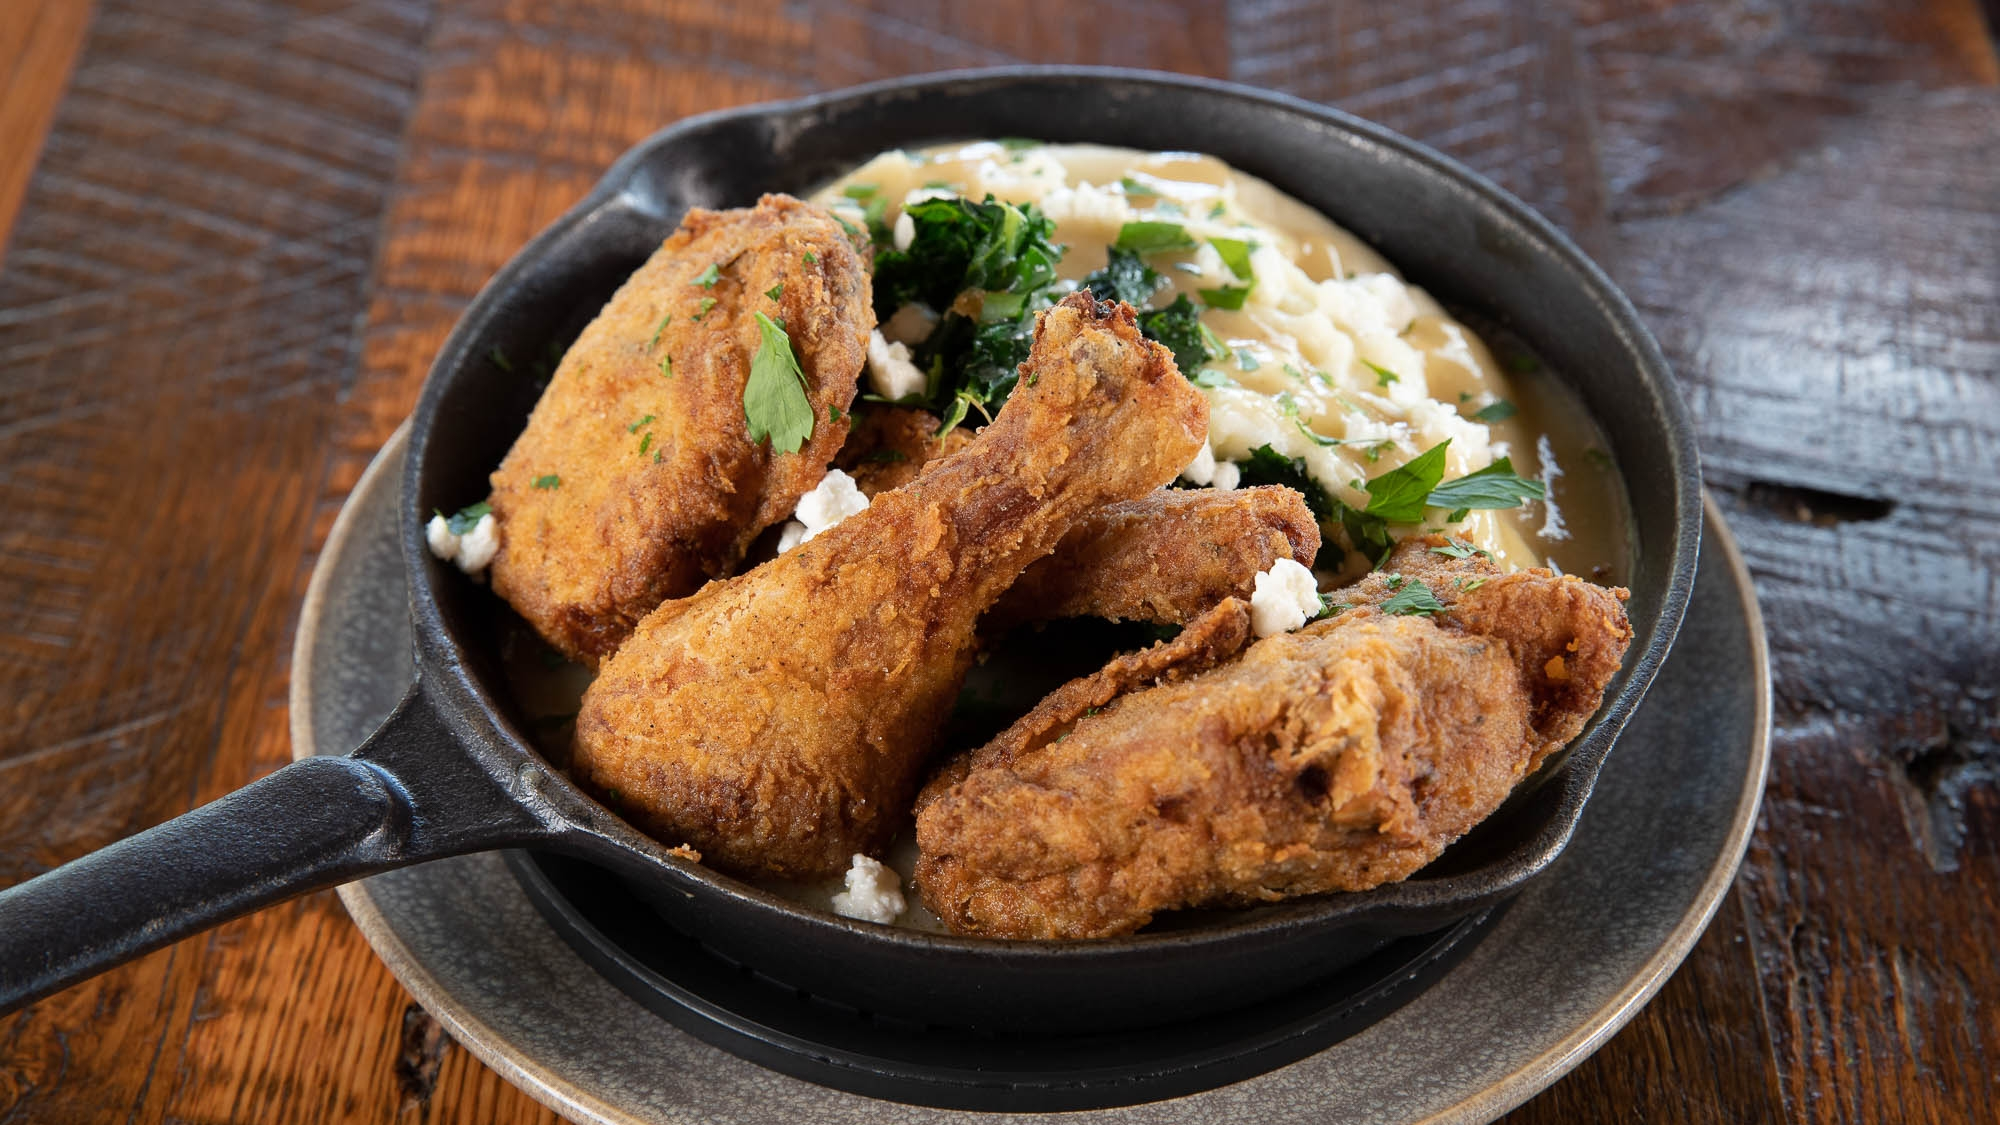 Eating House 1849 Koloa_Fried Chicken- pc Craig Bixel_AM9I5121.jpg